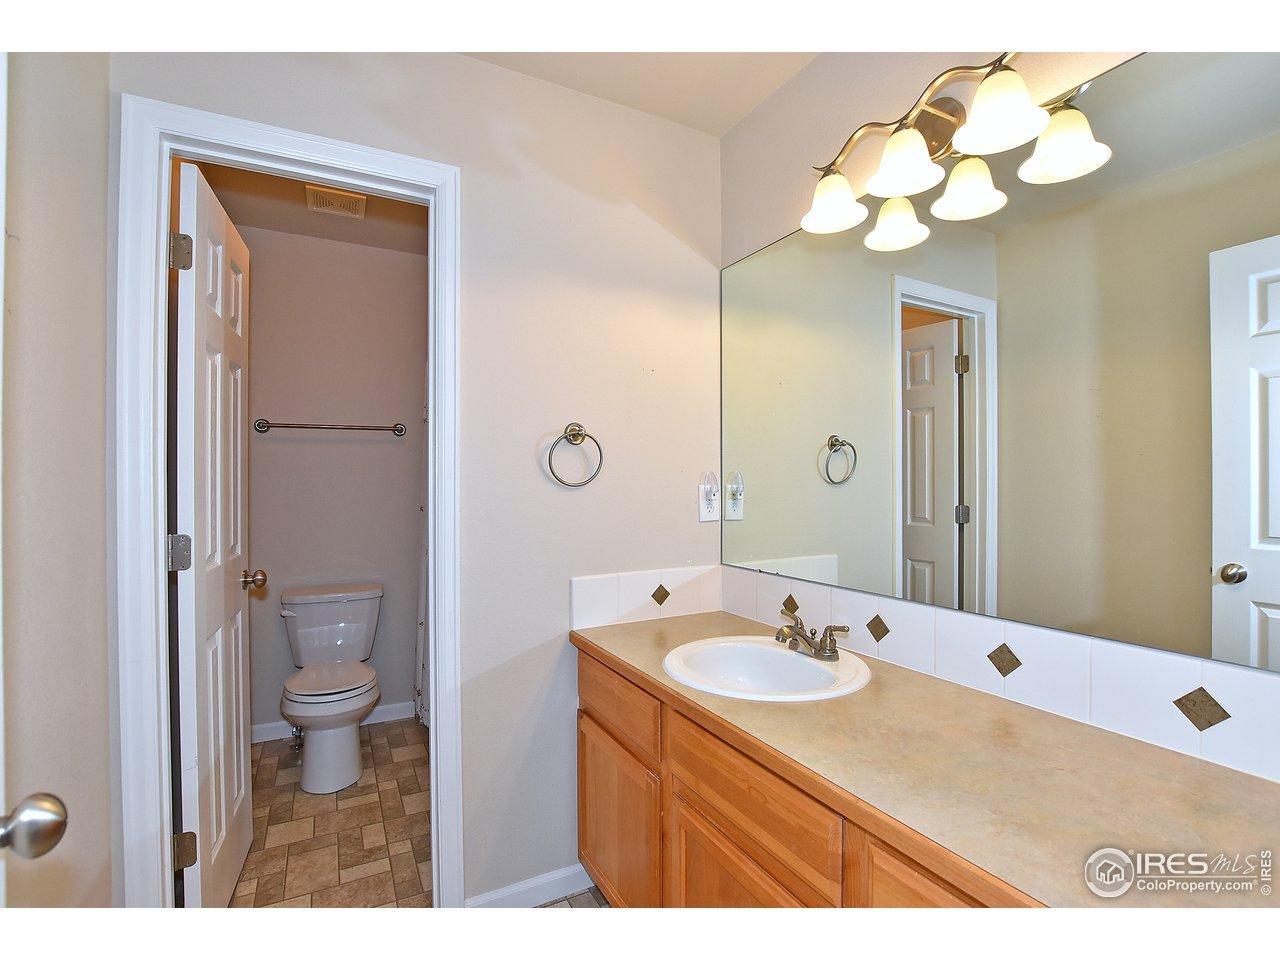 Shared full bathroom upstairs